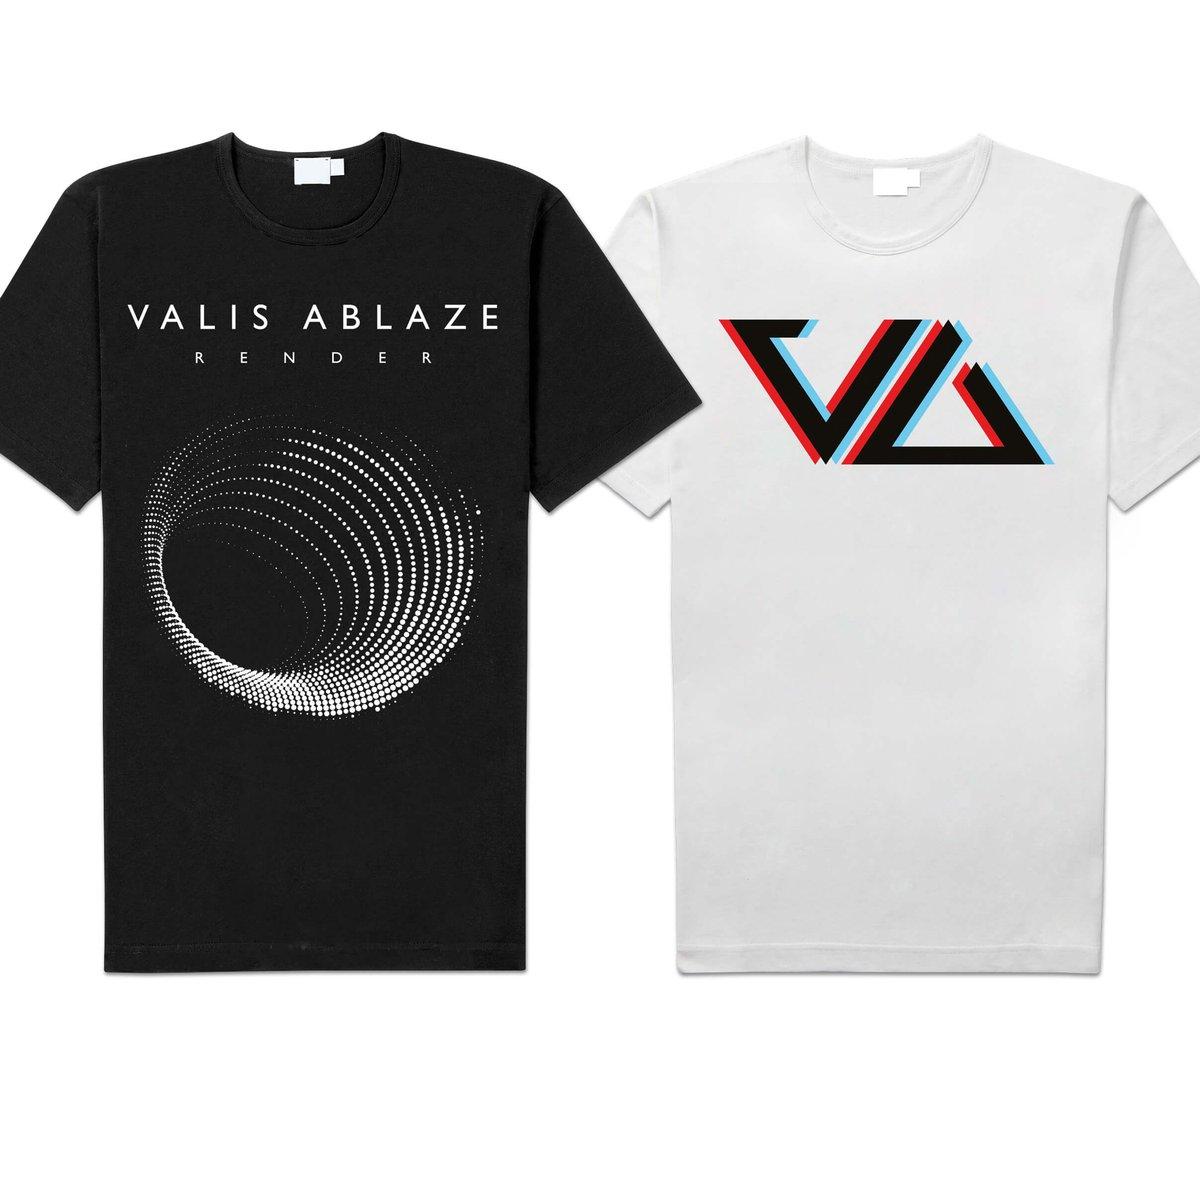 "Image of Valis Ablaze ""Render"" / ""Logo"" Shirts"